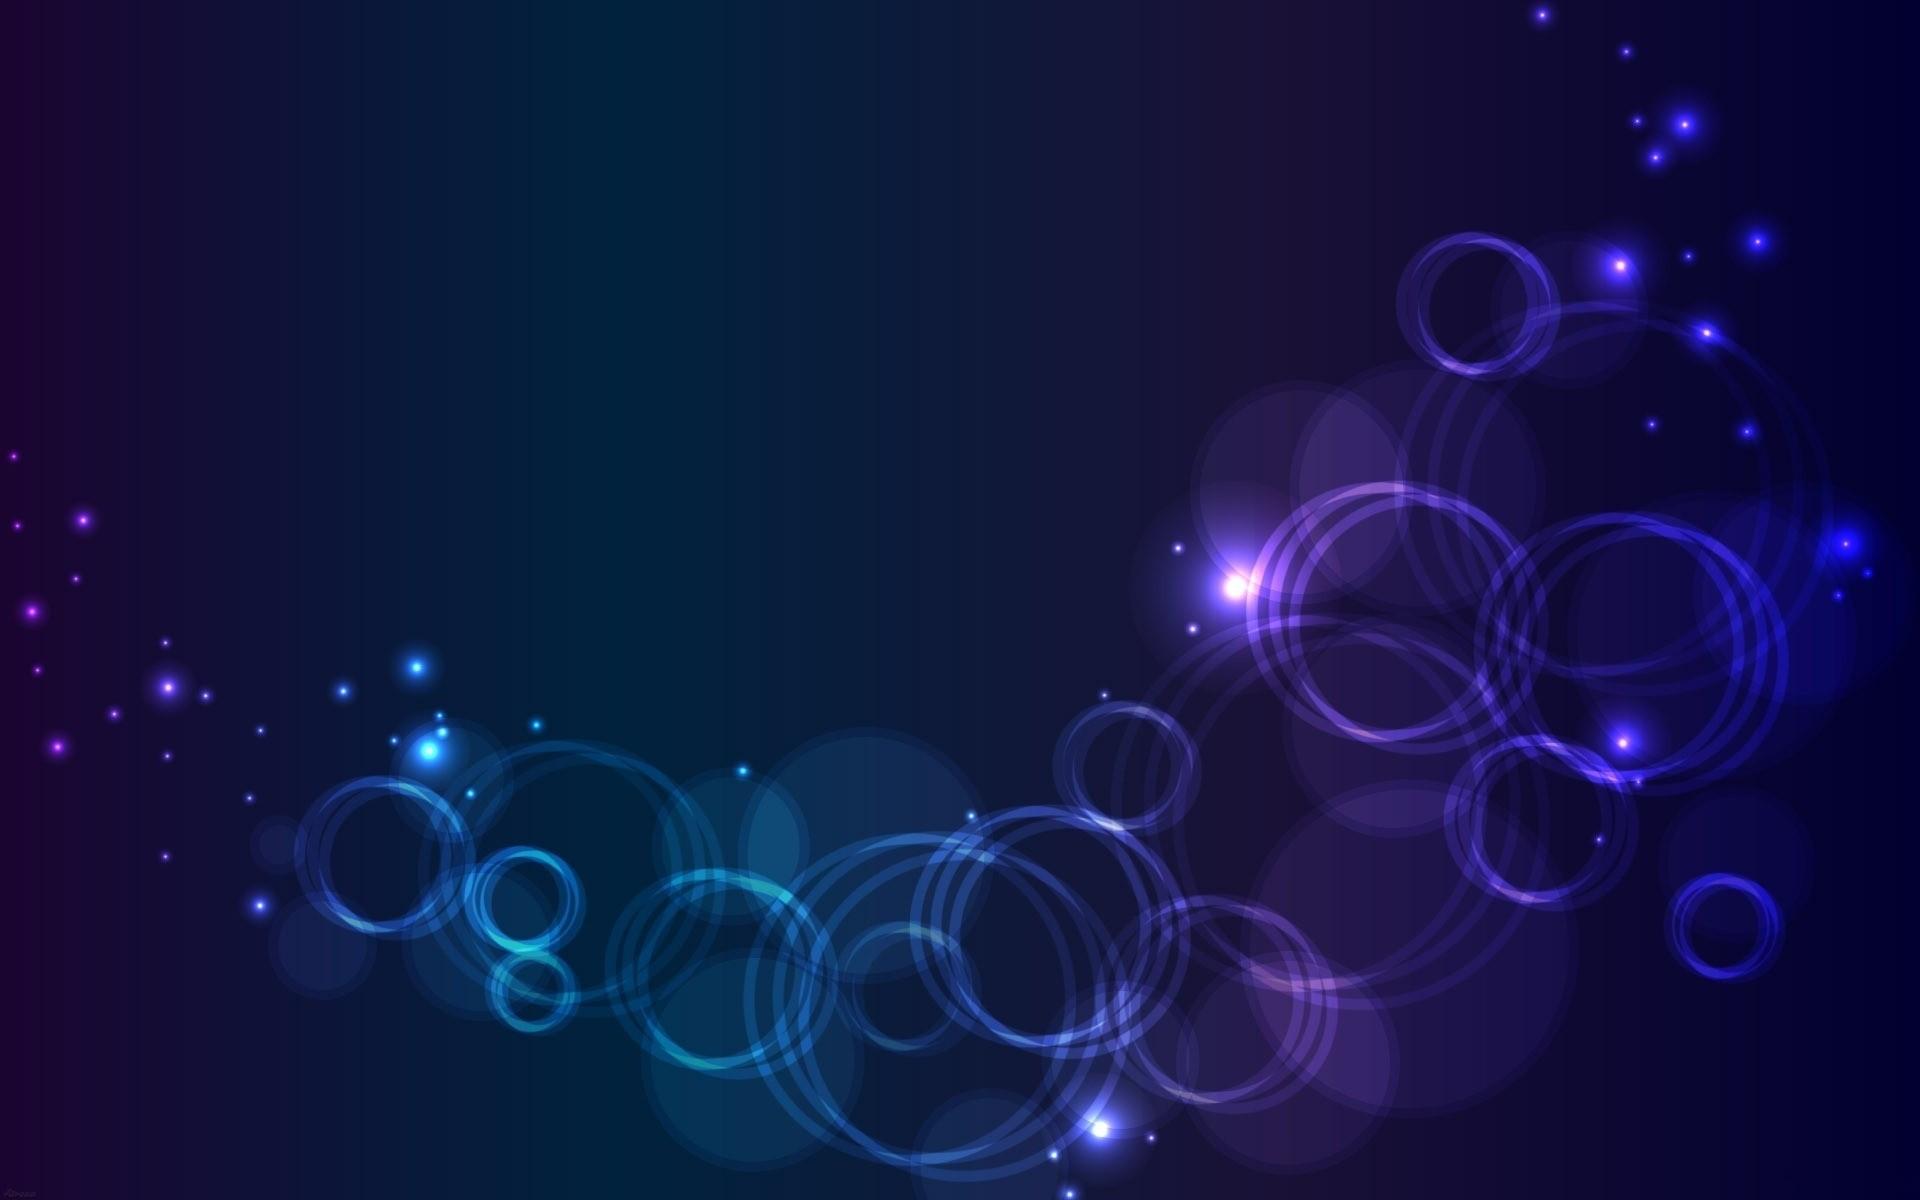 Hd Bubbles Wallpaper Download Bubble Hd Backgrounds Pixelstalk Net